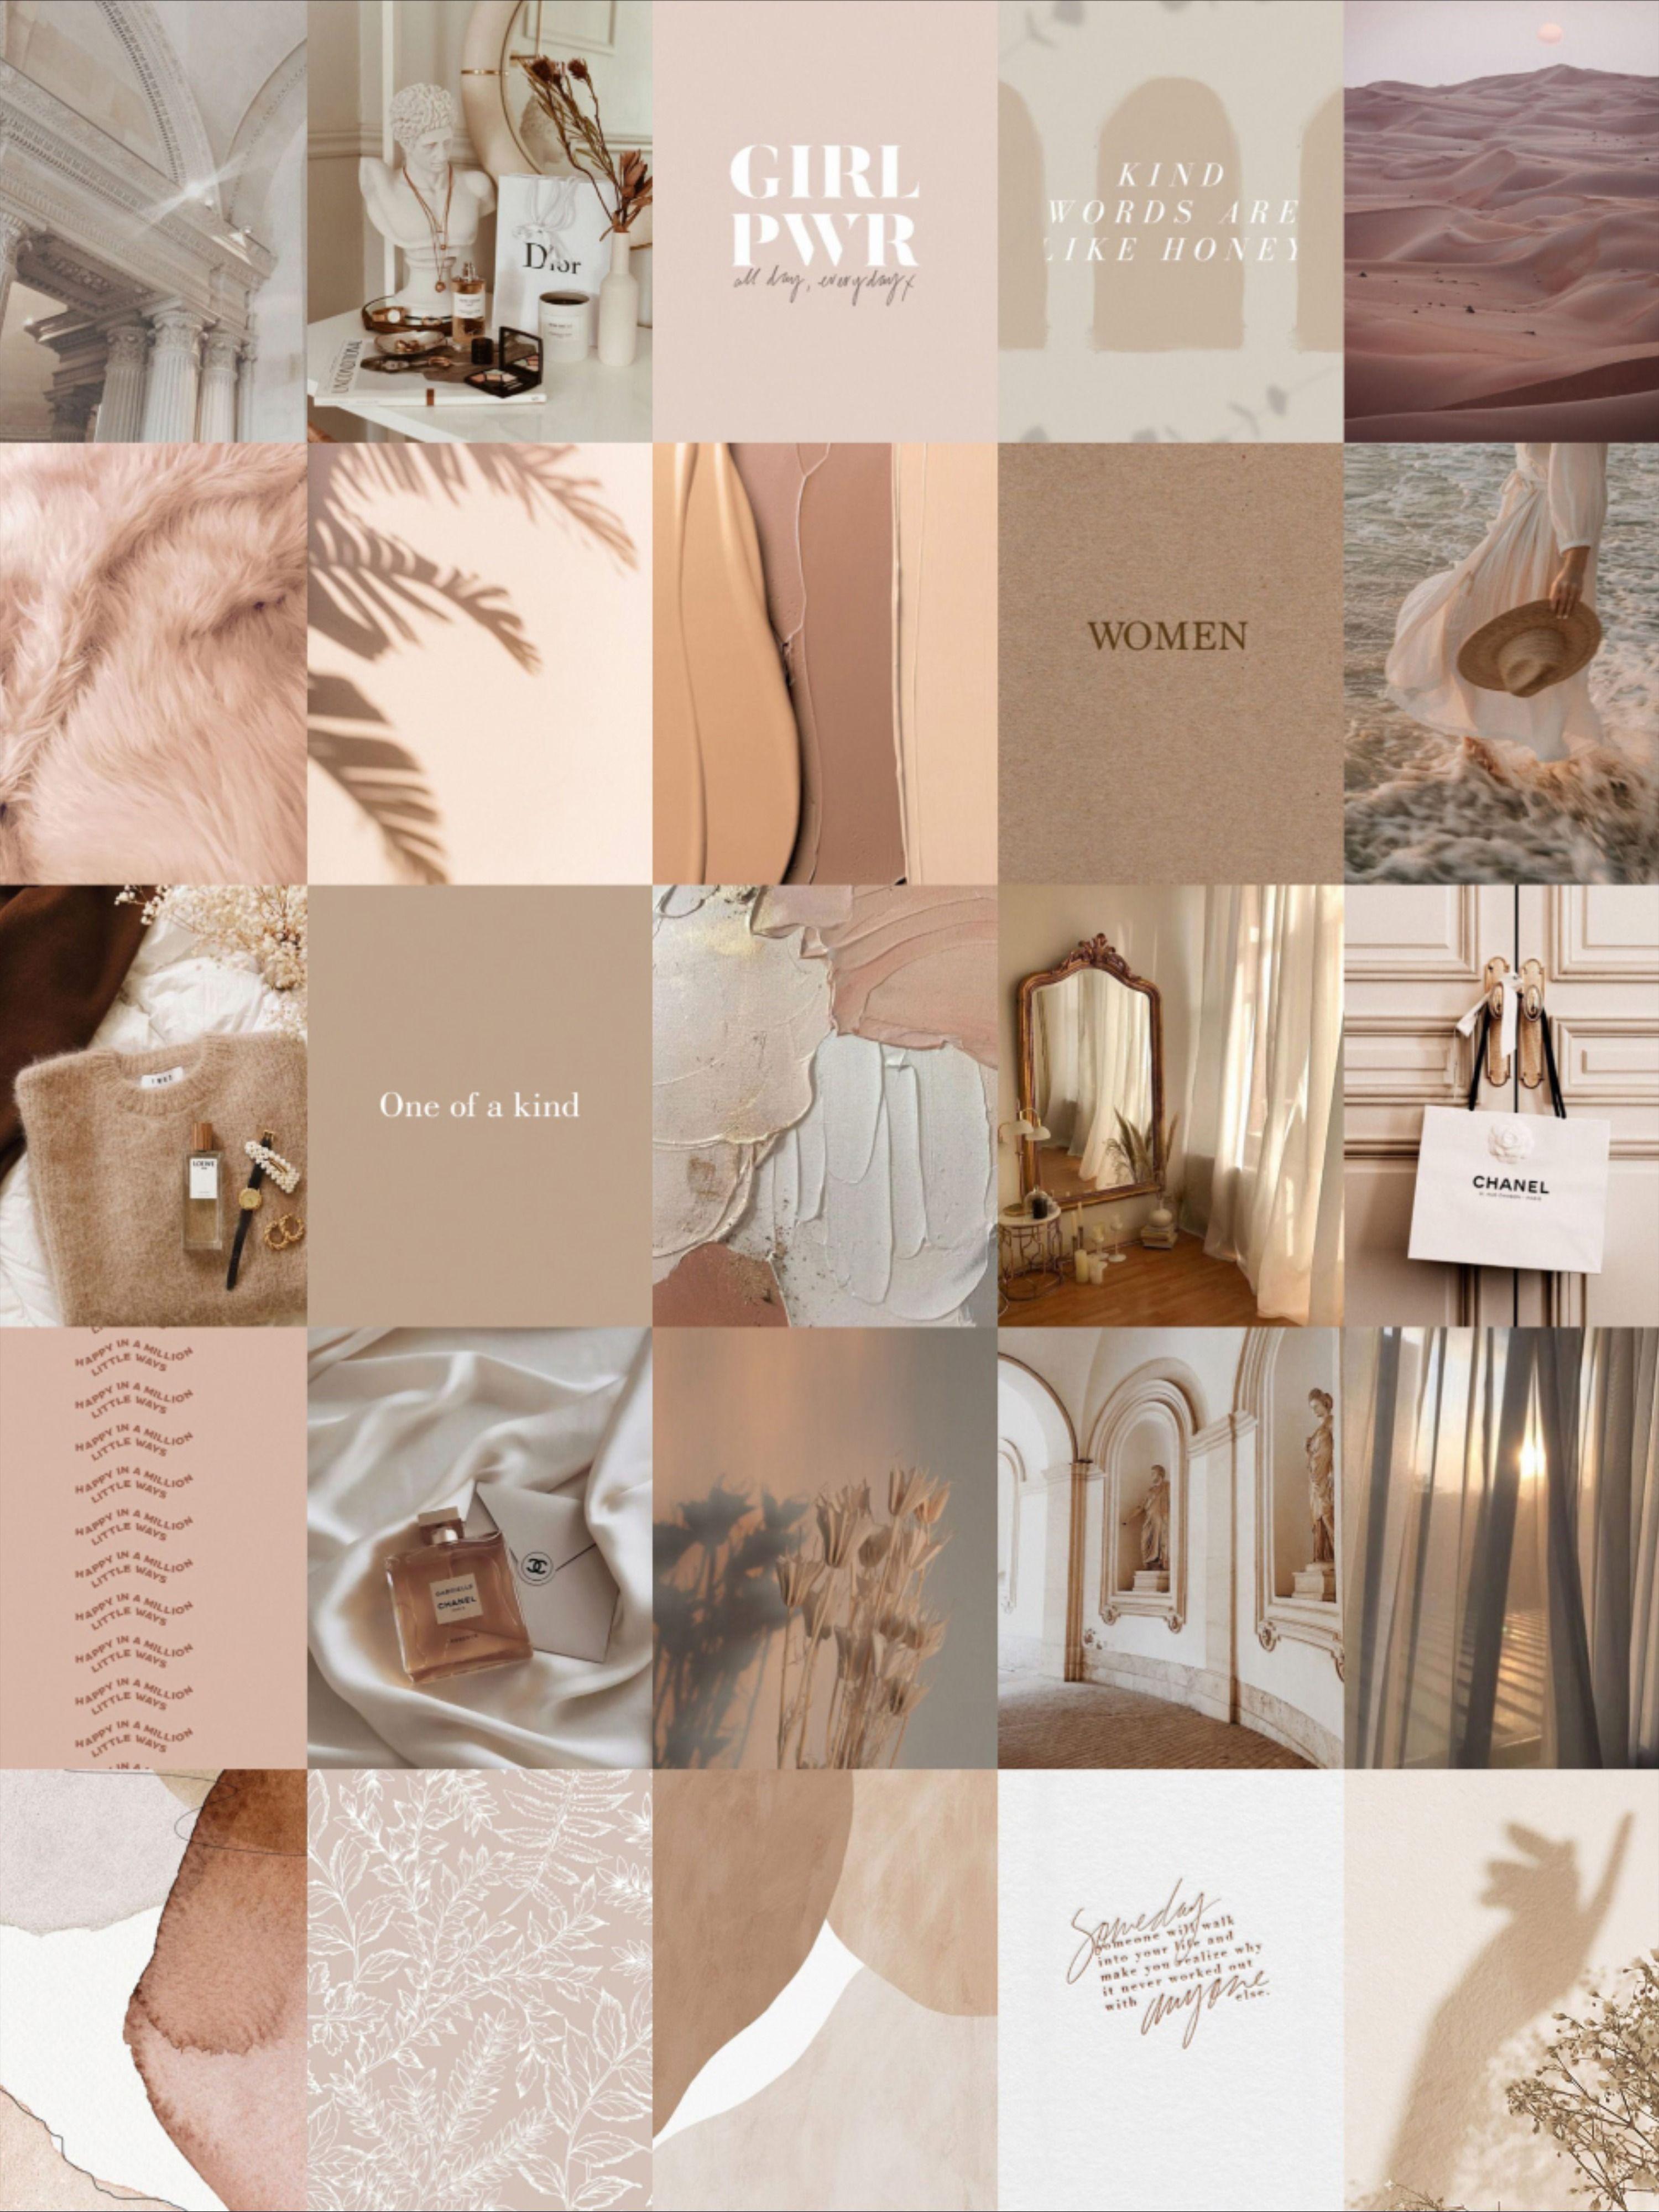 beige wall collage kit aesthetic digital prints